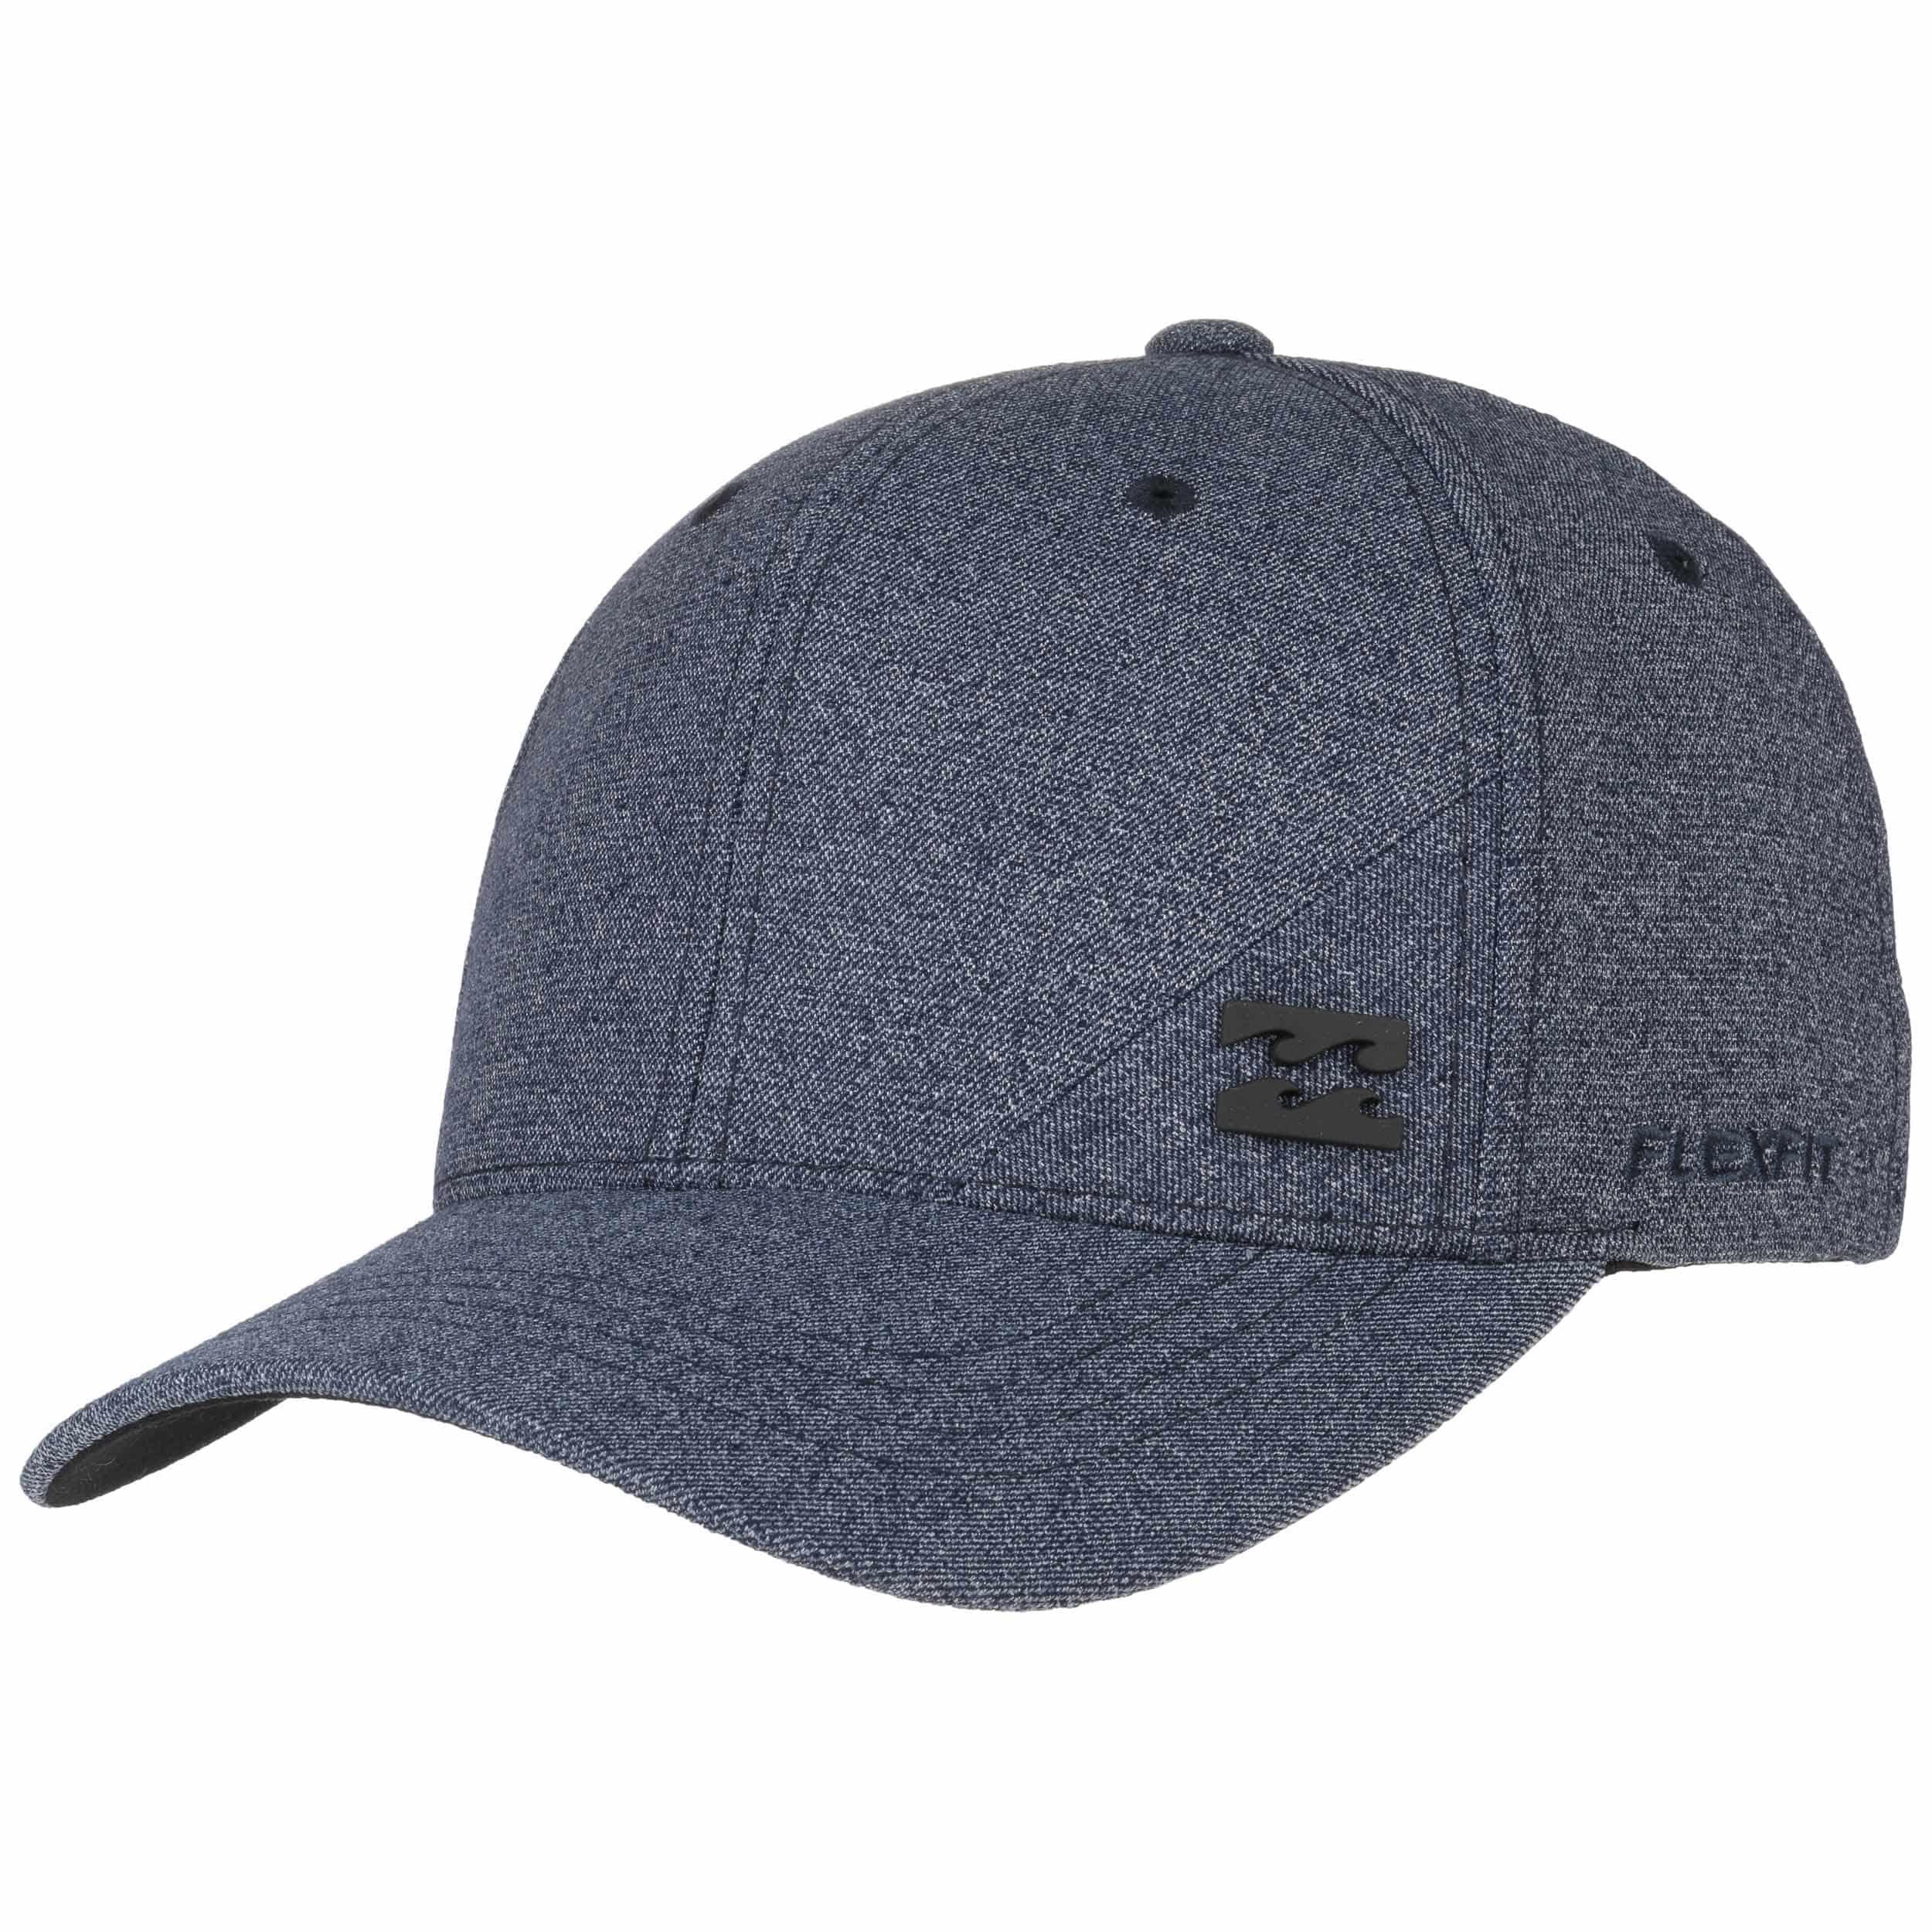 570b575dd4716 ... sale station flexfit cap by billabong blau 7 5a2cf 7e474